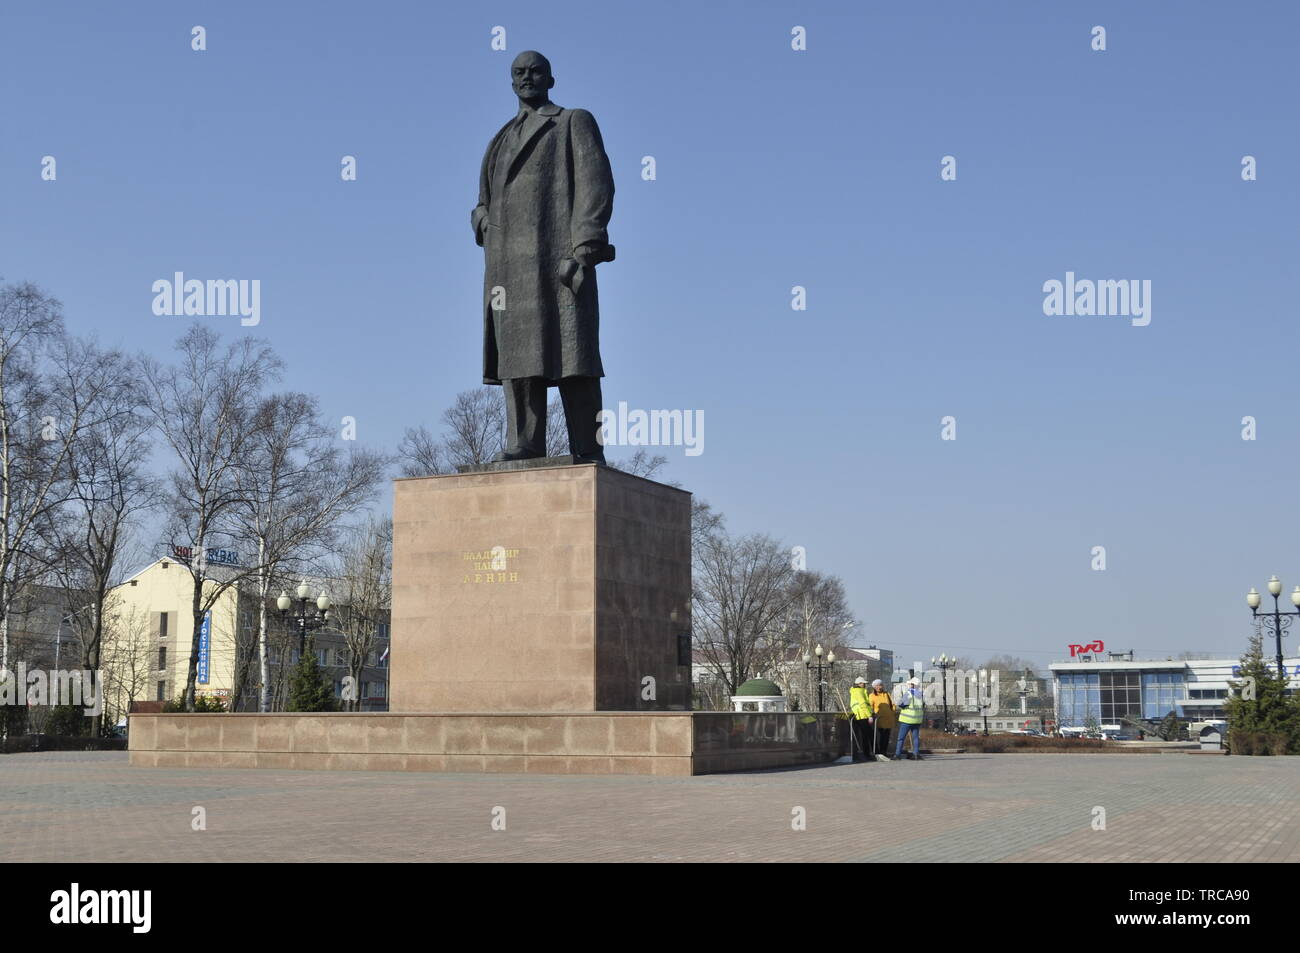 Lenin Square, Yuzhno-Sakhalinsk  Sakhalin Island Остров  Сахалин Russia Stock Photo